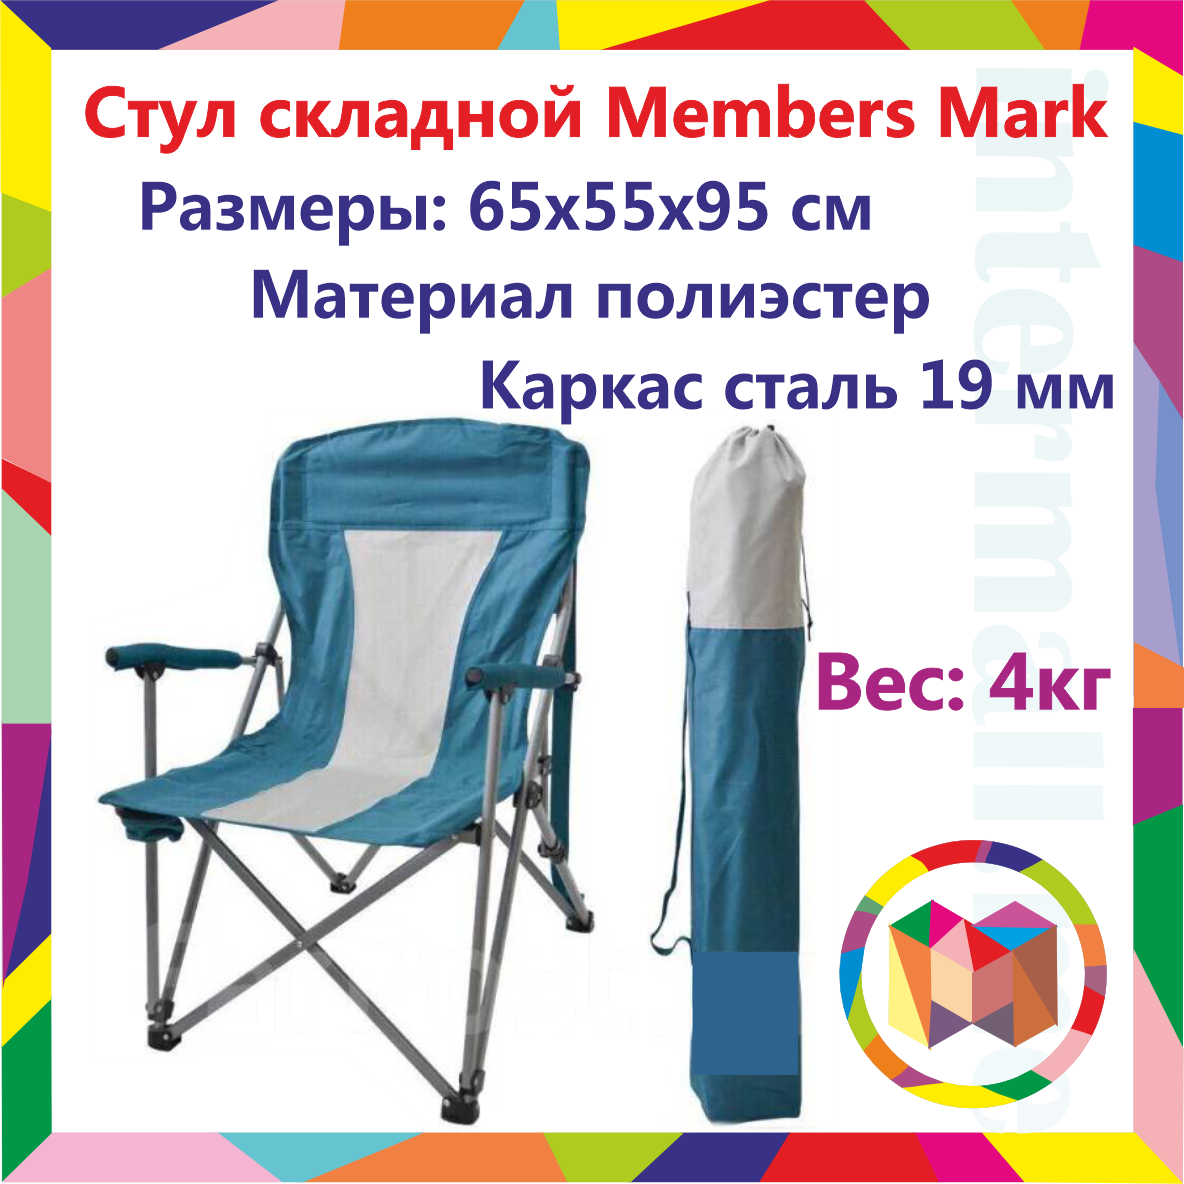 Стул складной для пикника, с металлическим каркасом, стул Member's Mark, 53х42х74 см